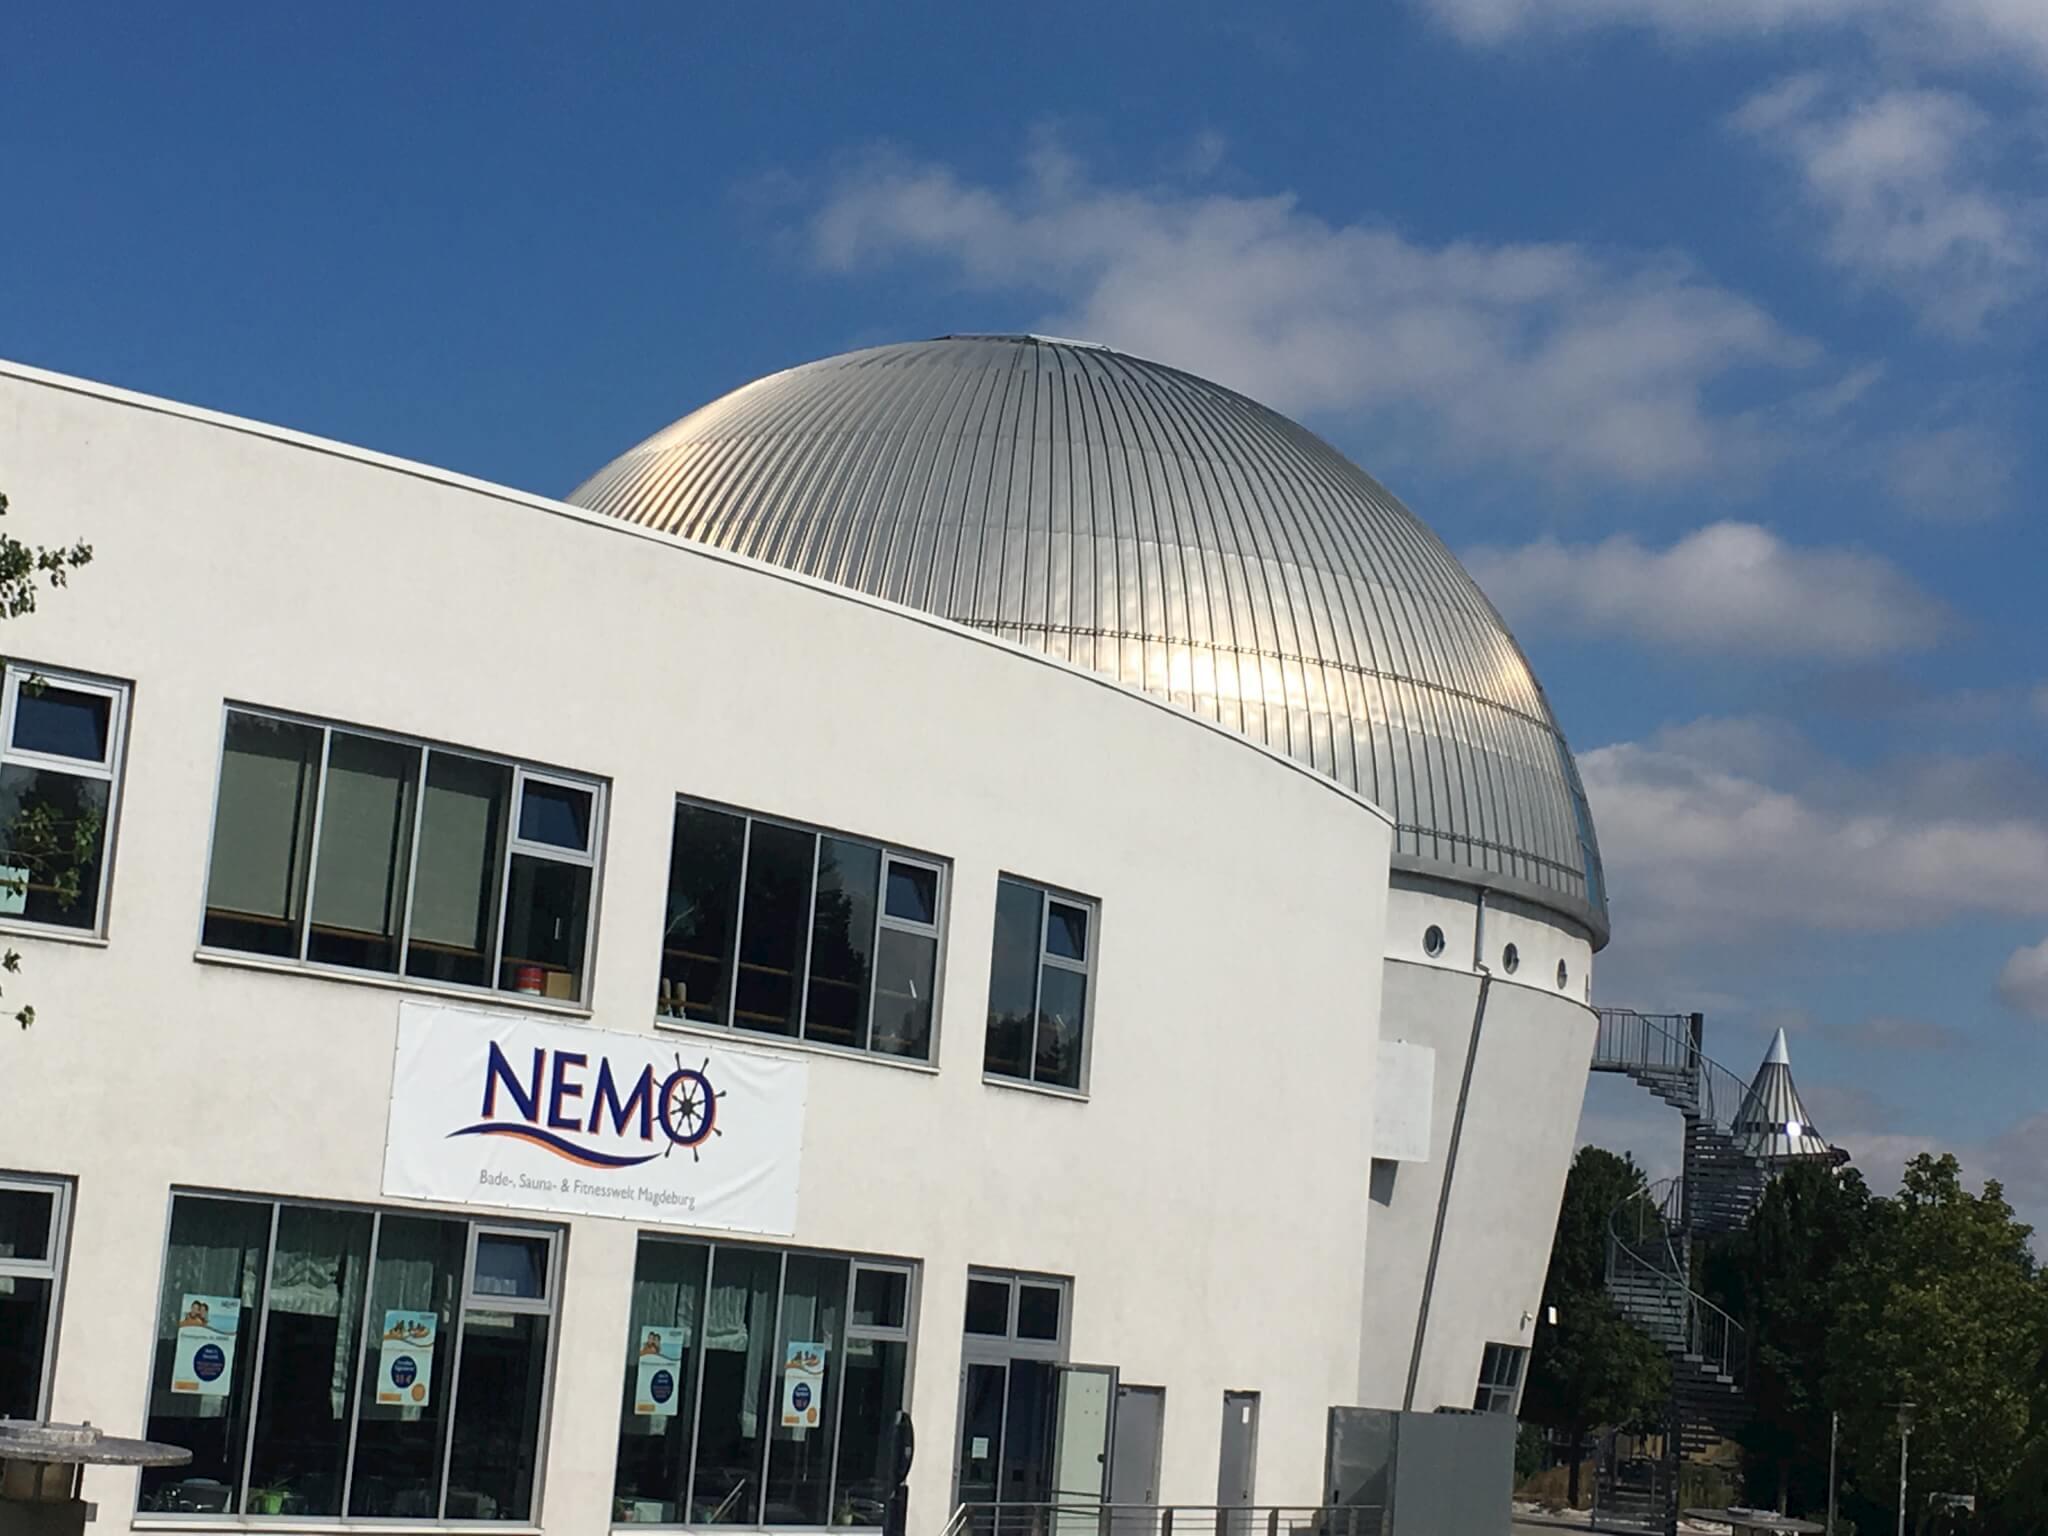 Nemo, Magdeburg